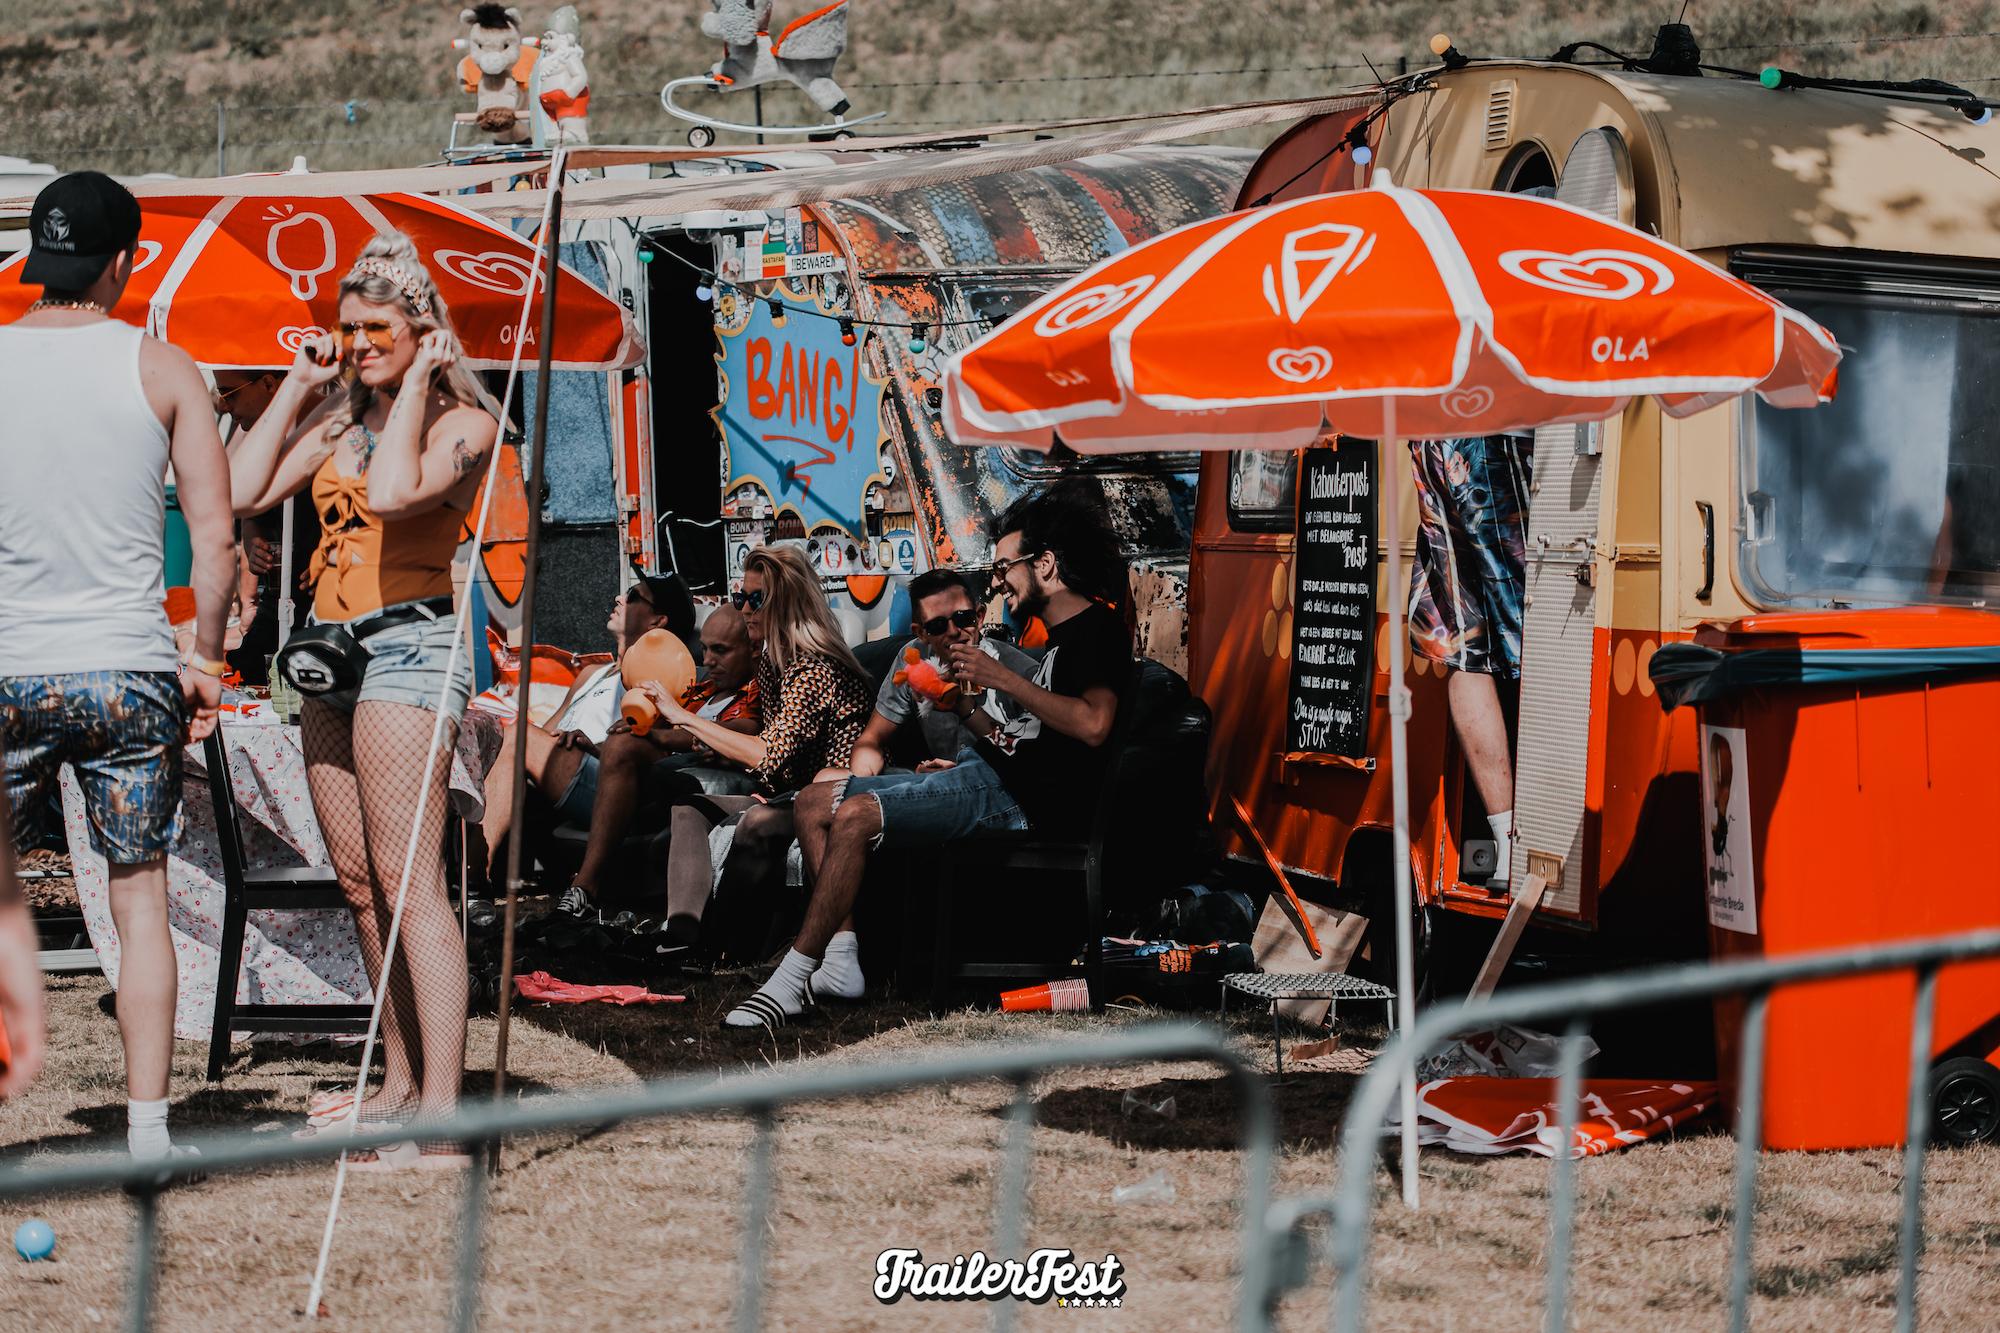 TrailerFest camping